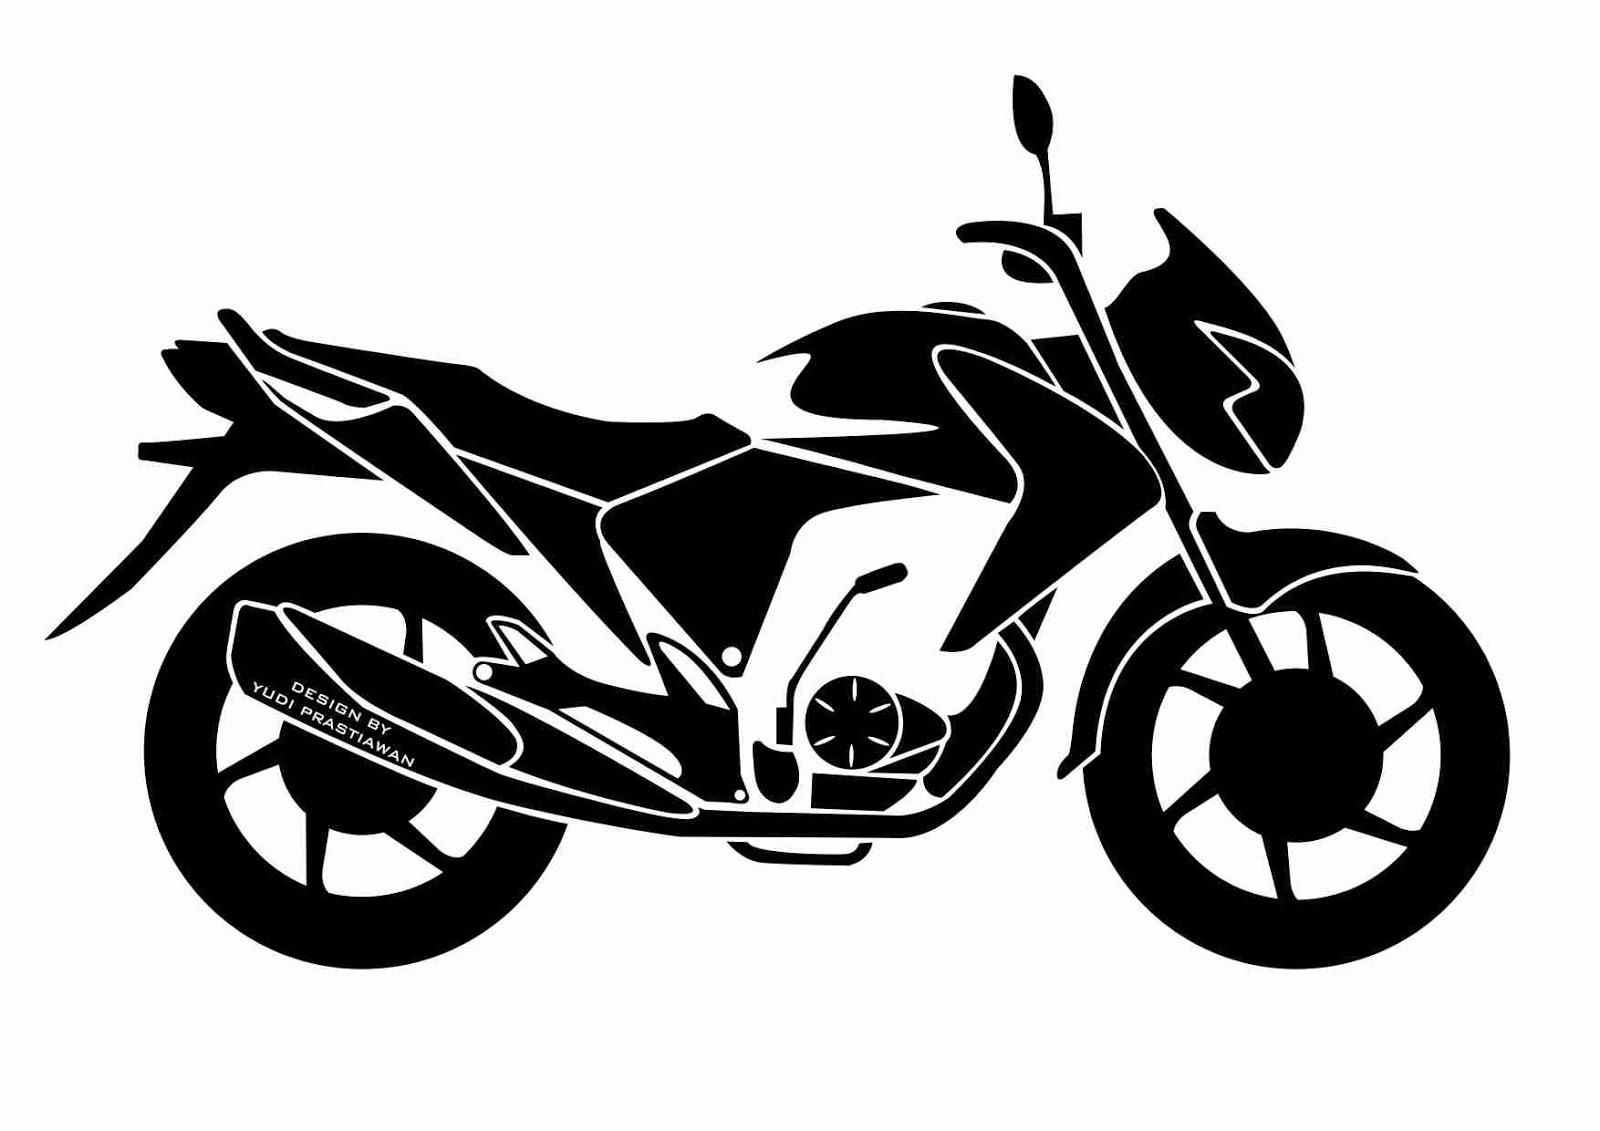 Desain Vektor Motorcyle by Yudi Prastiawan